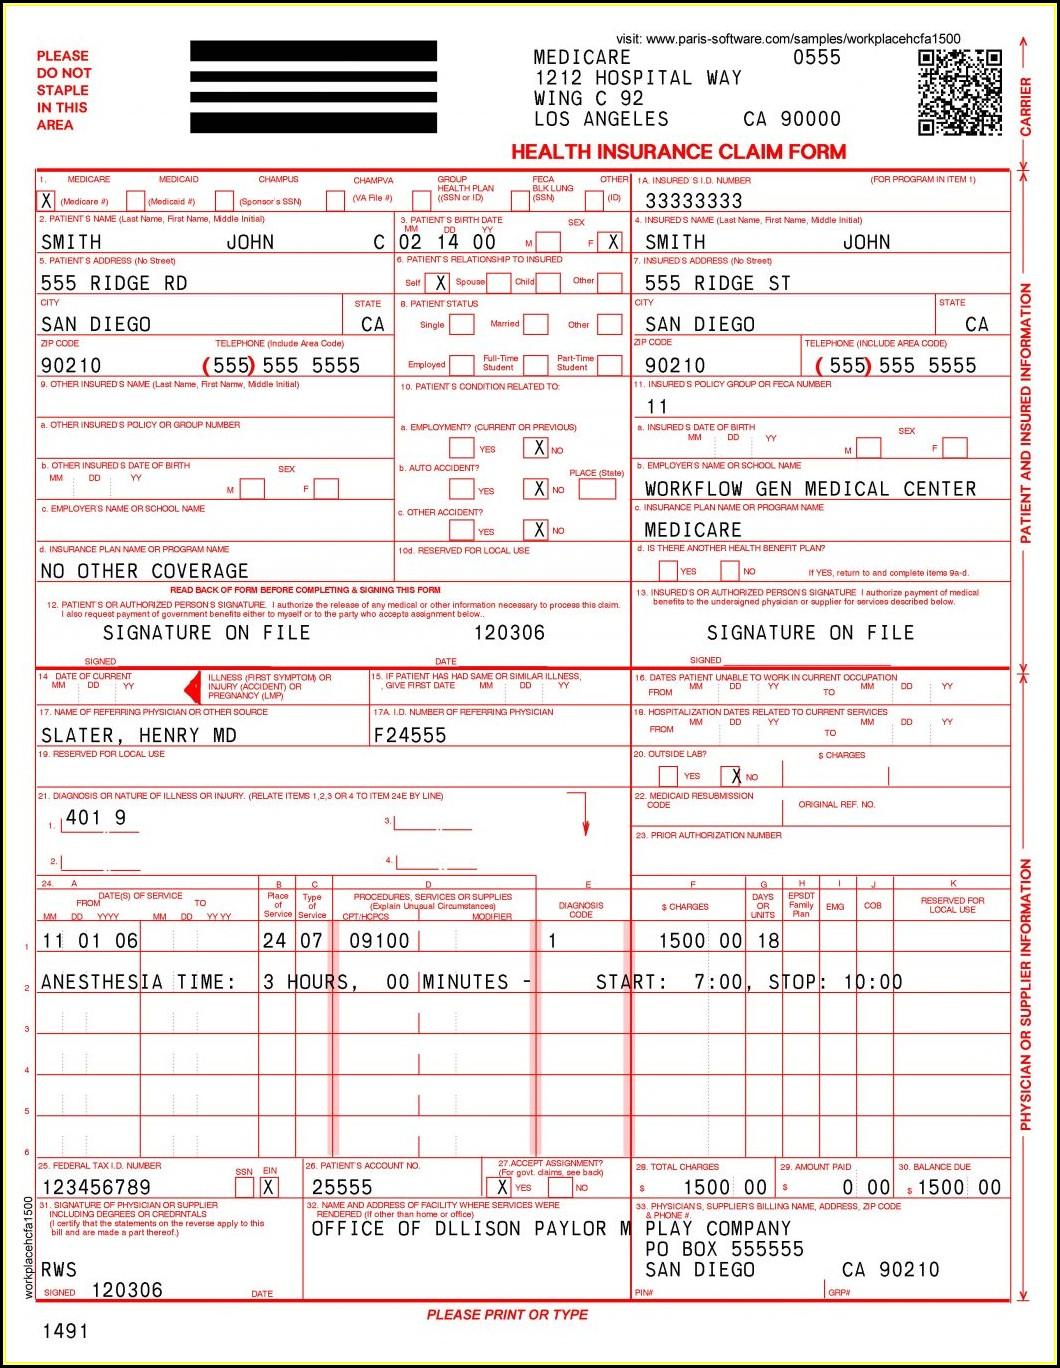 Free Hcfa 1500 Forms Printable